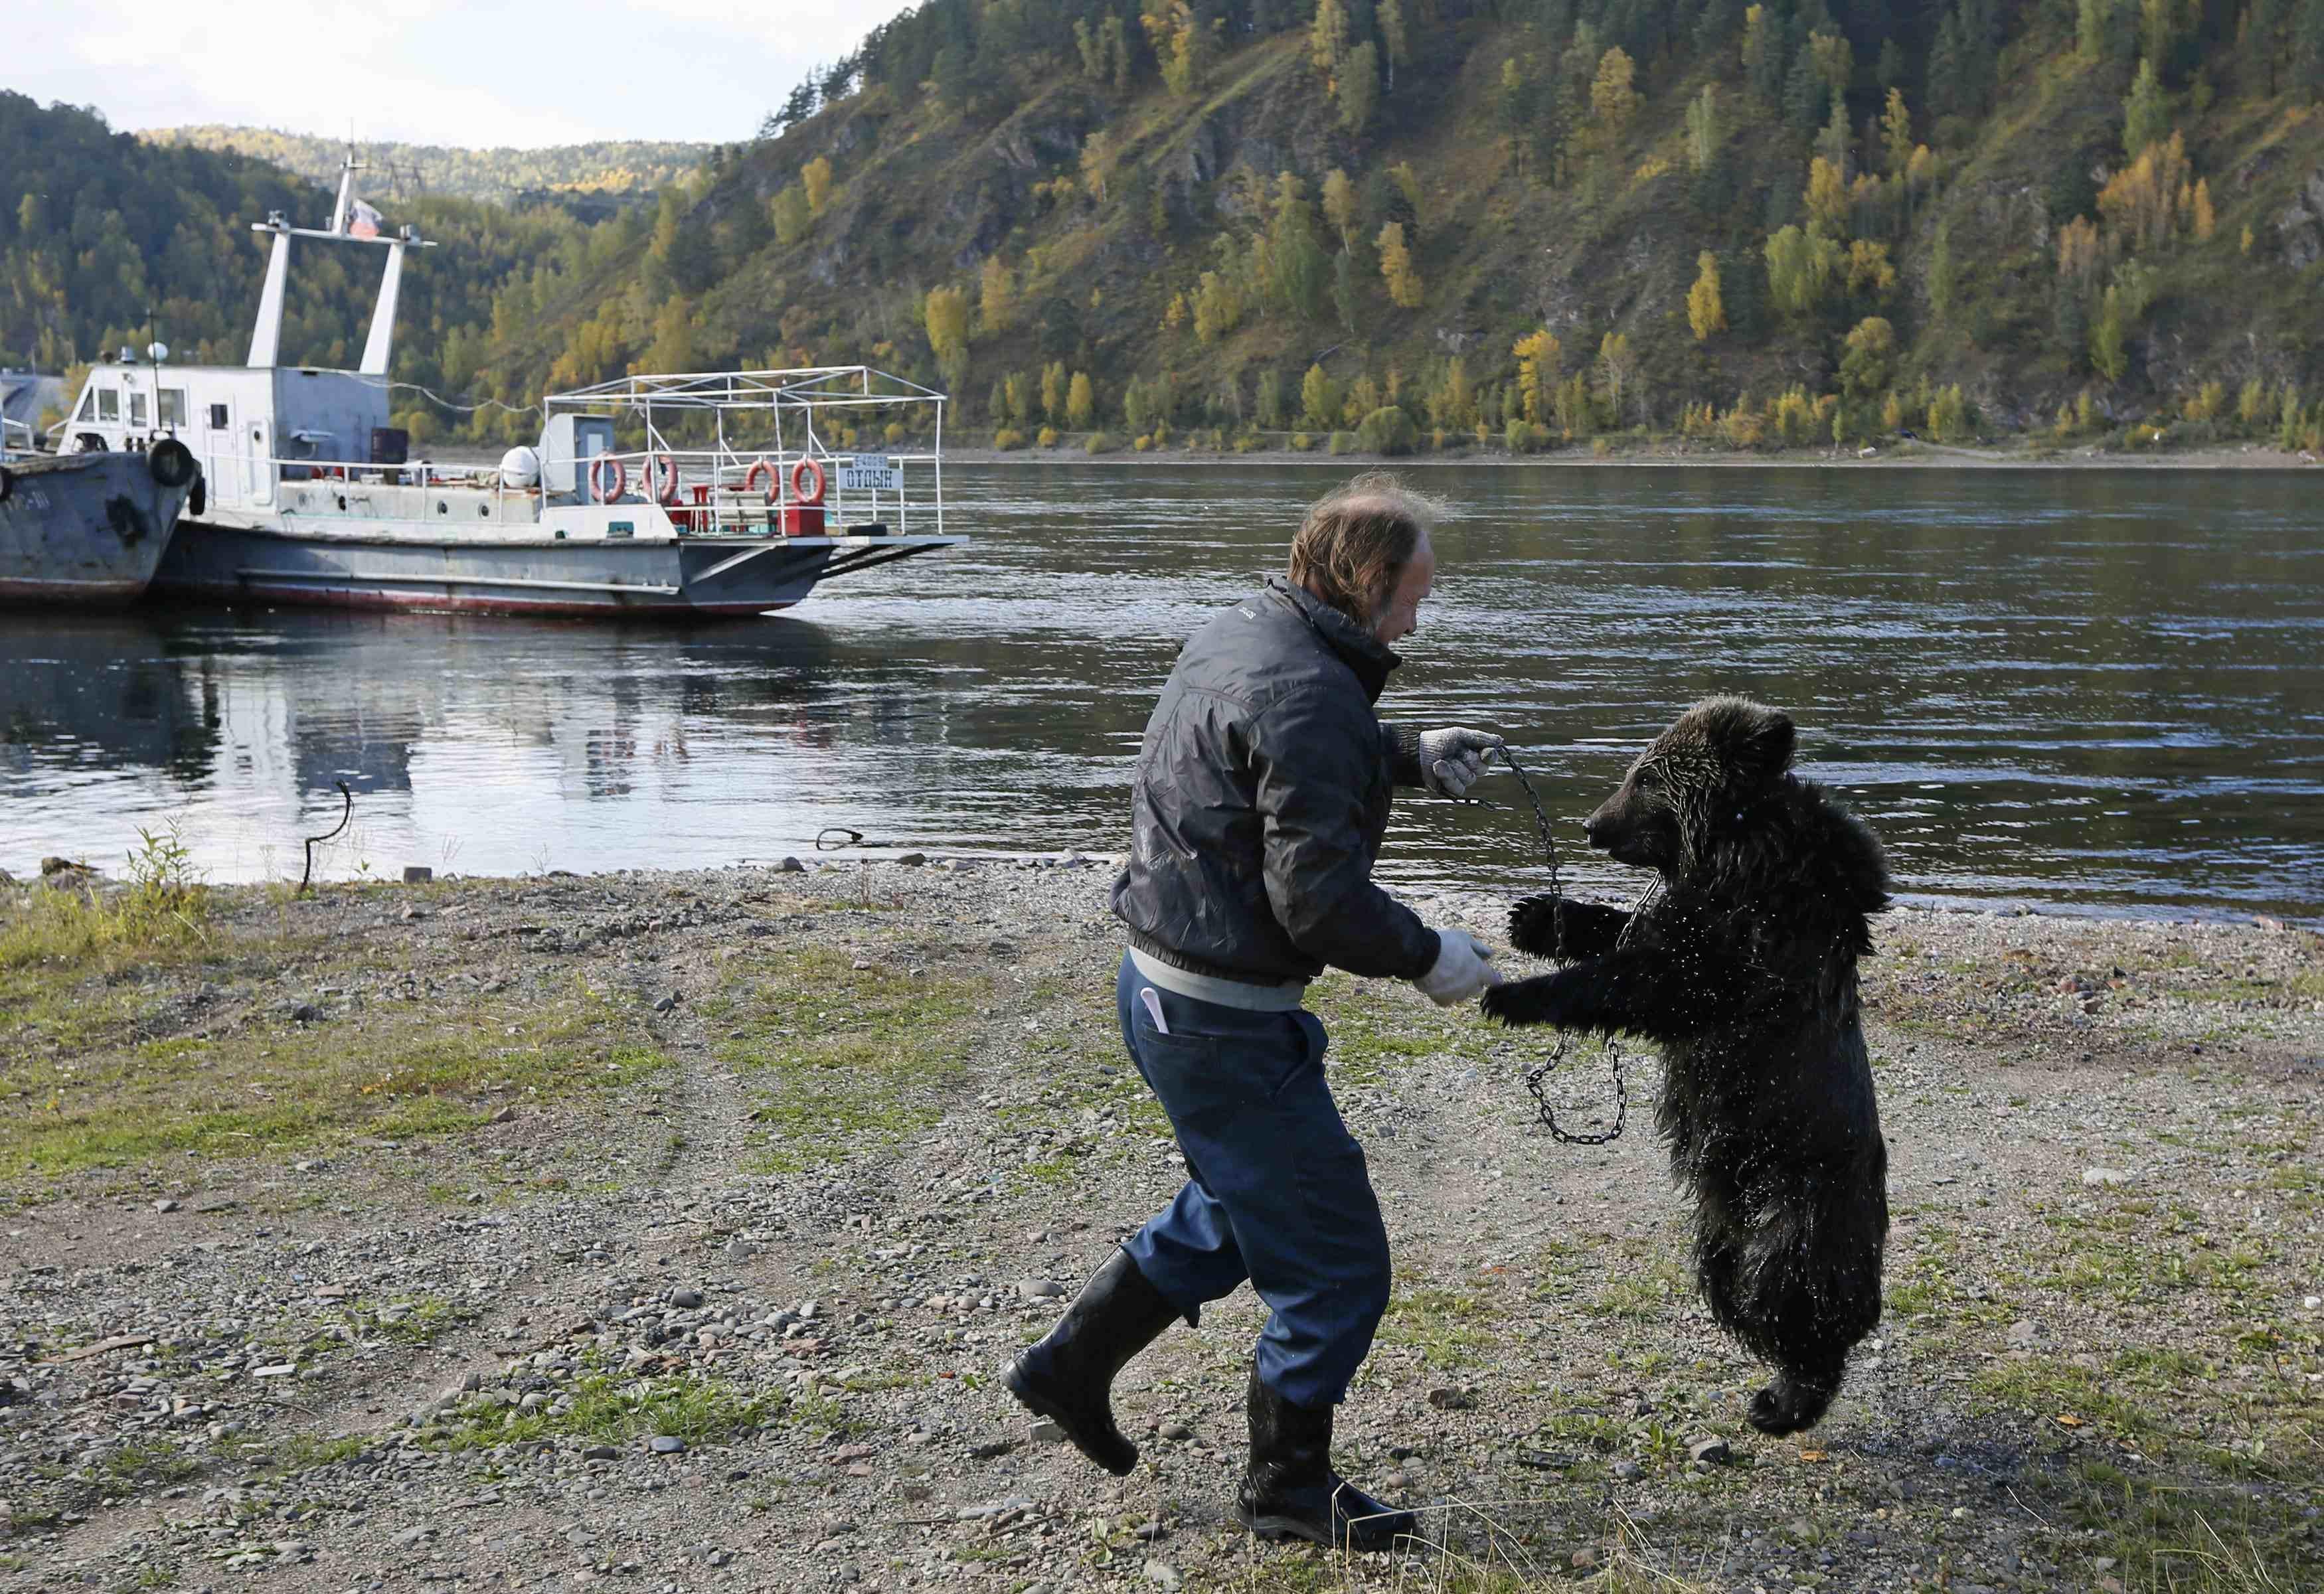 Alexander Kharatokin plays with a 9-month-old brown bear named Masha on the banks of the Yenisei River outside Krasnoyarsk, Siberia on Sept. 19, 2014.